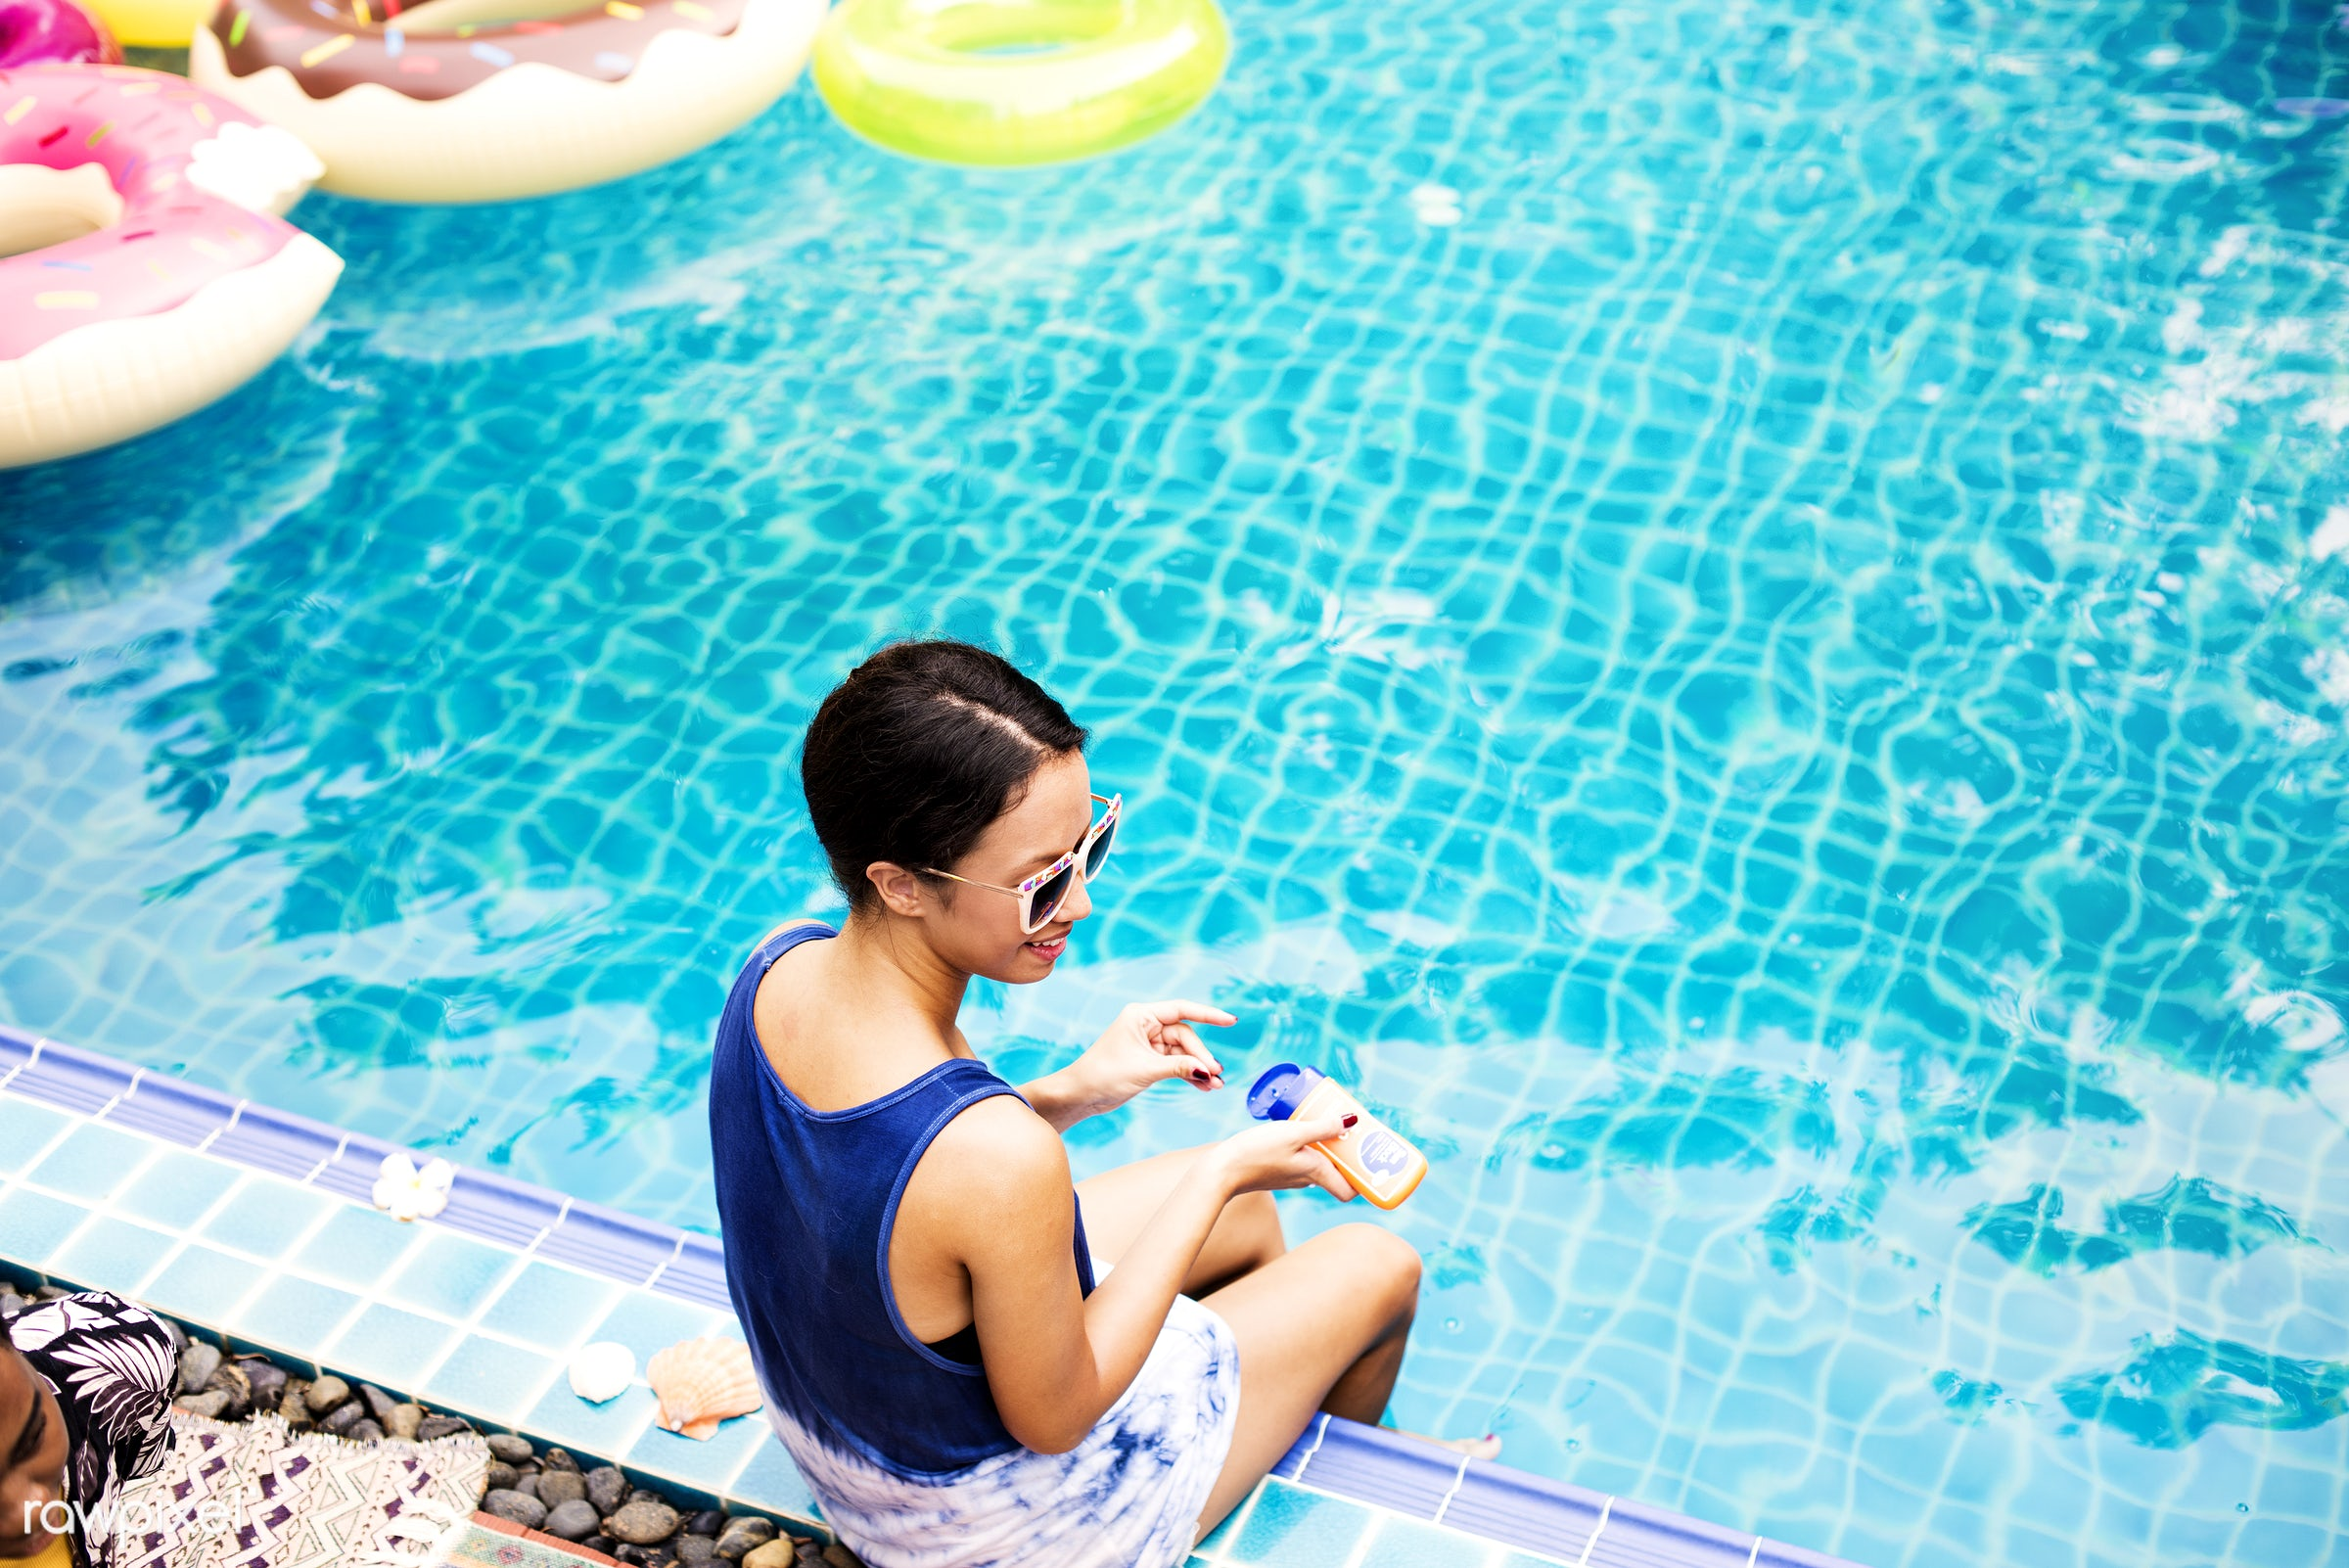 relax, recreation, asian, pool, woman, tubes, cheerful, smiling, enjoying, sunscreen, happiness, leisure, fun, sunglasses,...